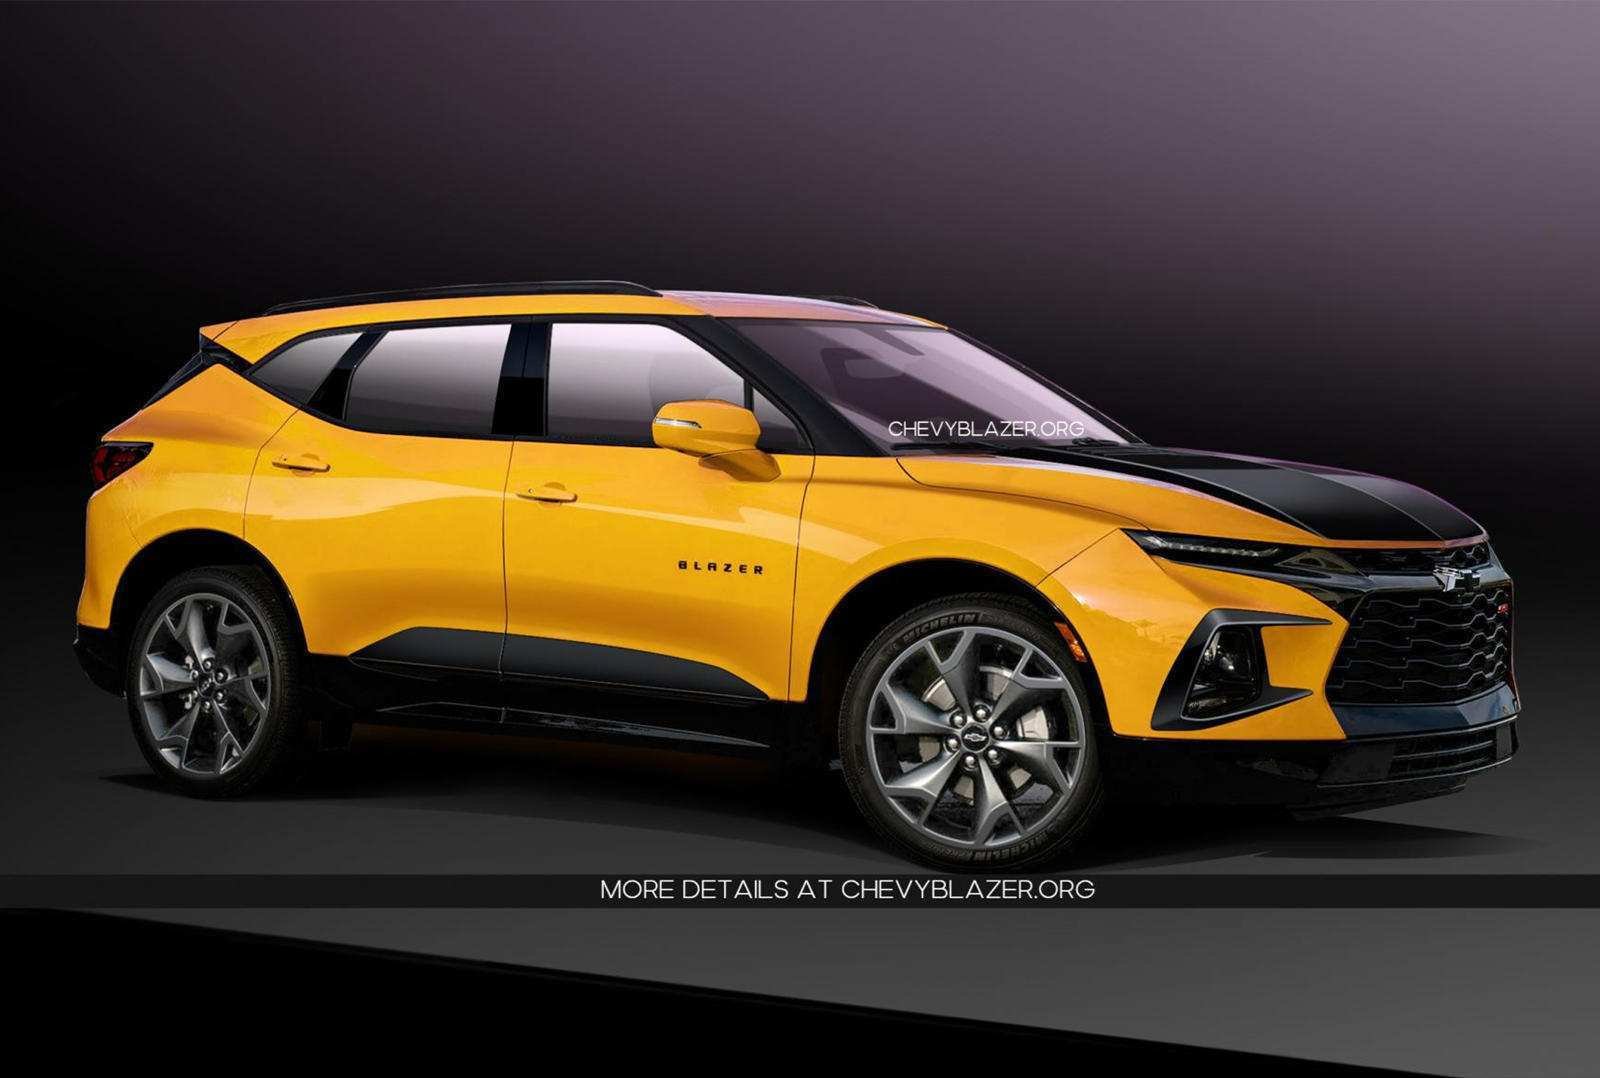 89 Concept of Chevrolet Trailblazer Ss 2020 Wallpaper with Chevrolet Trailblazer Ss 2020